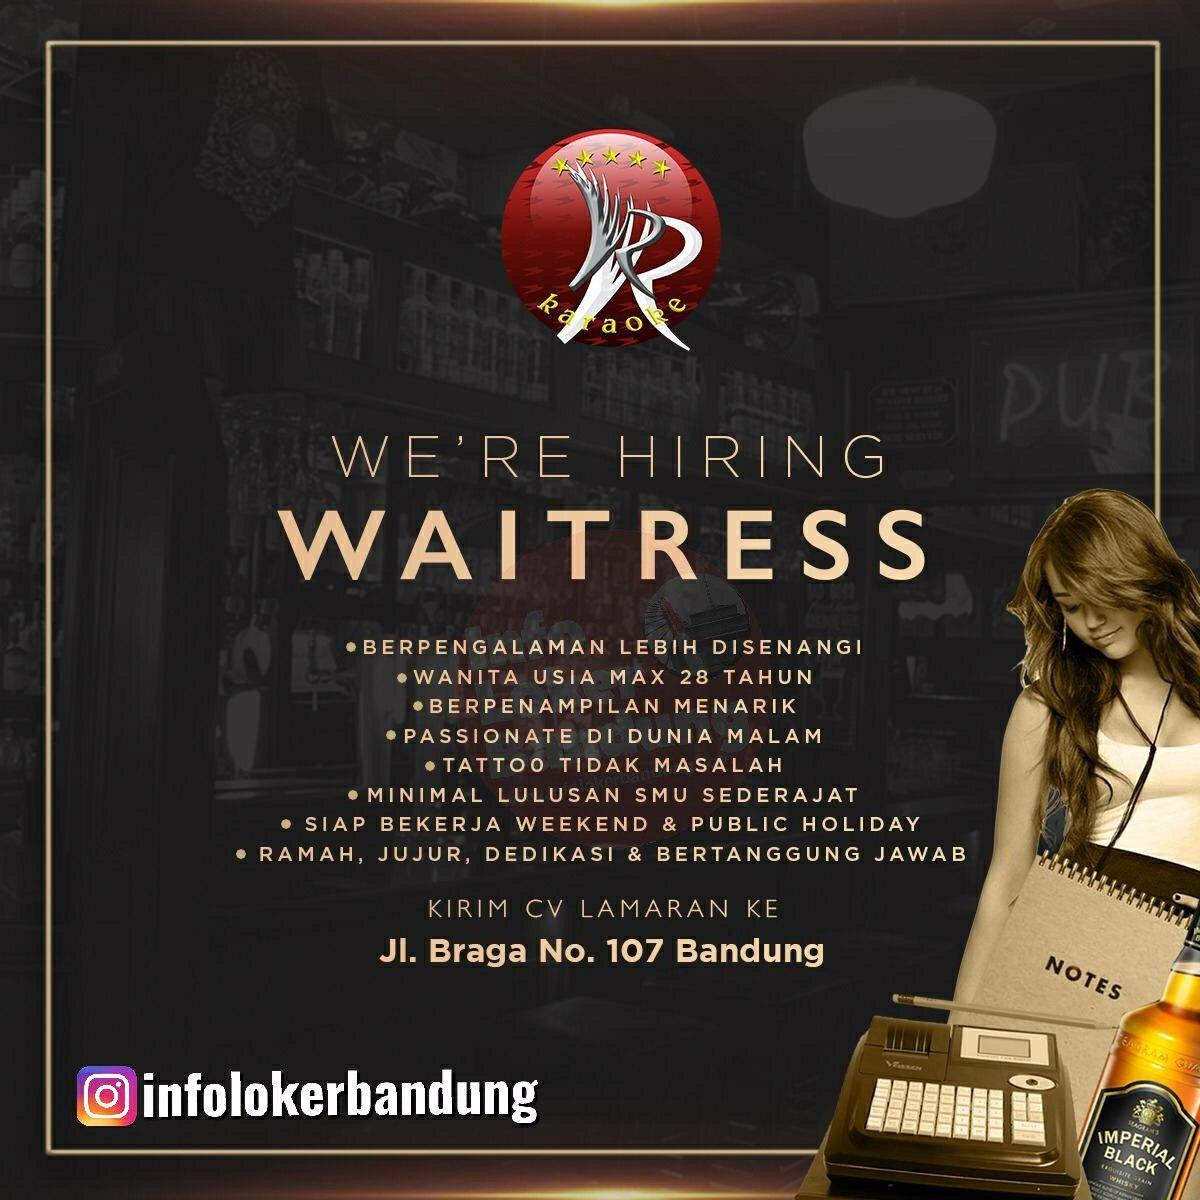 Lowongan Kerja Waitress VR Karaoke Bandung Agustus 2019